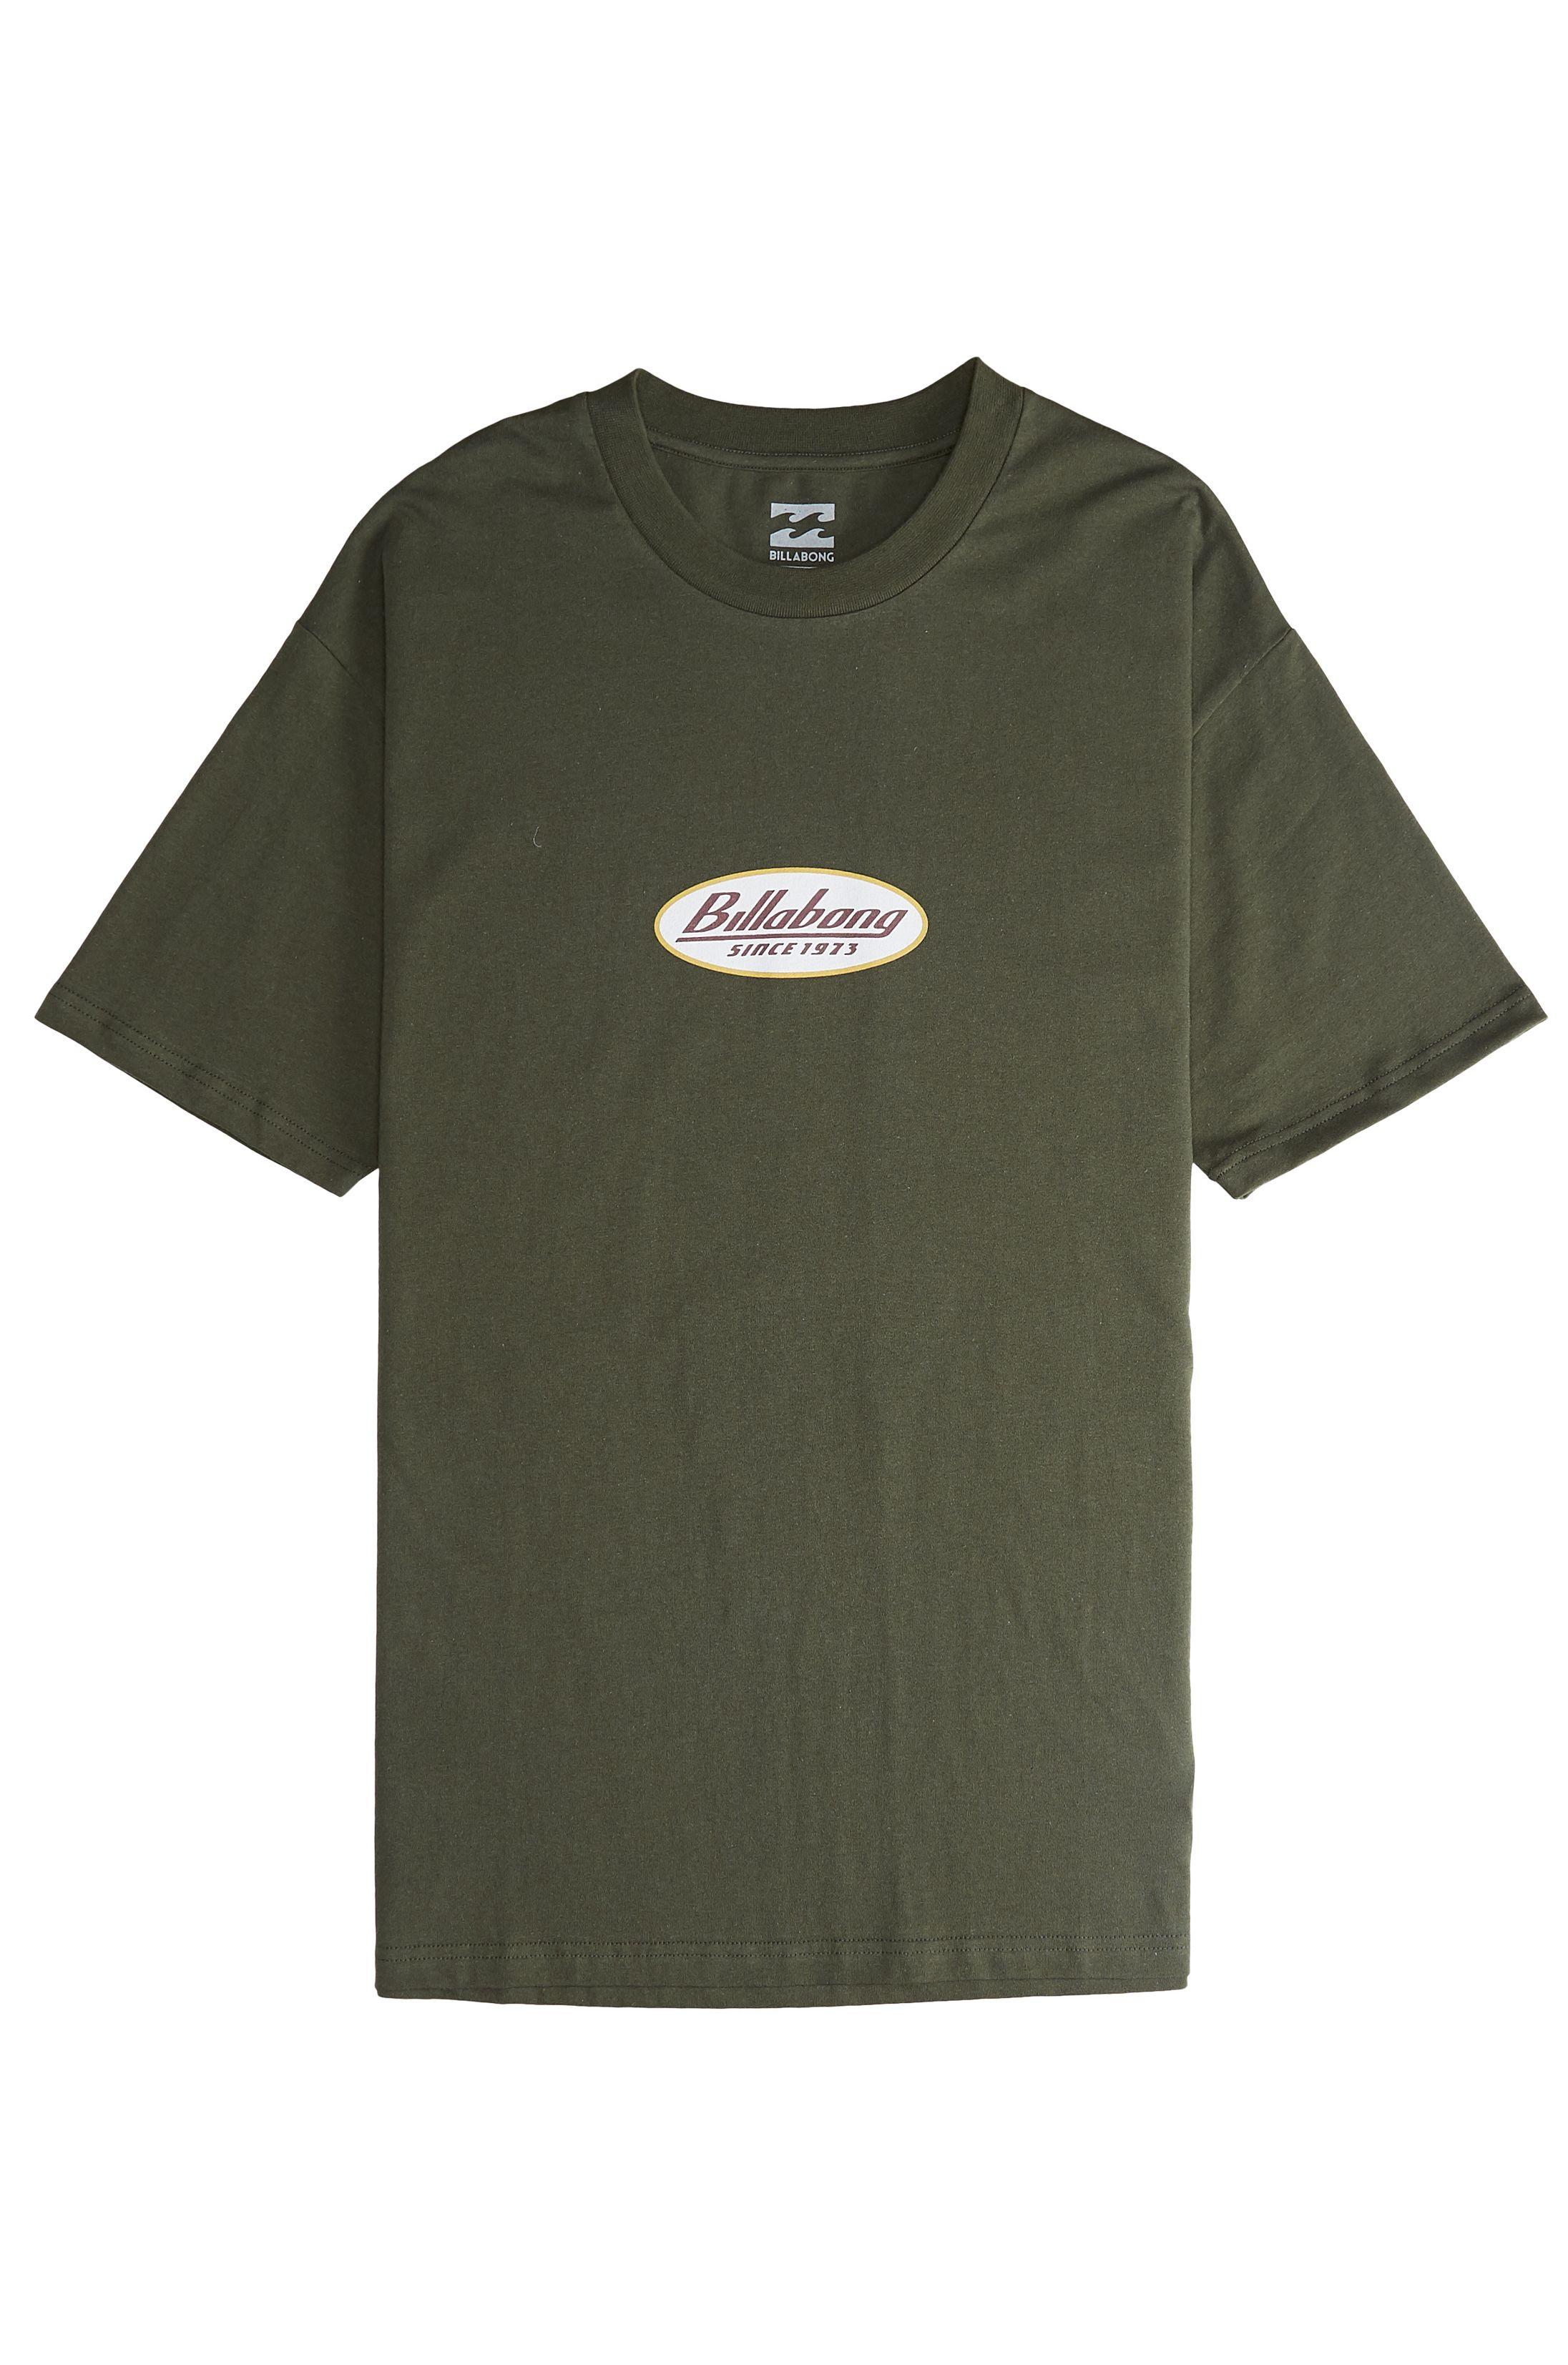 Billabong T-Shirt 97 Dark Military